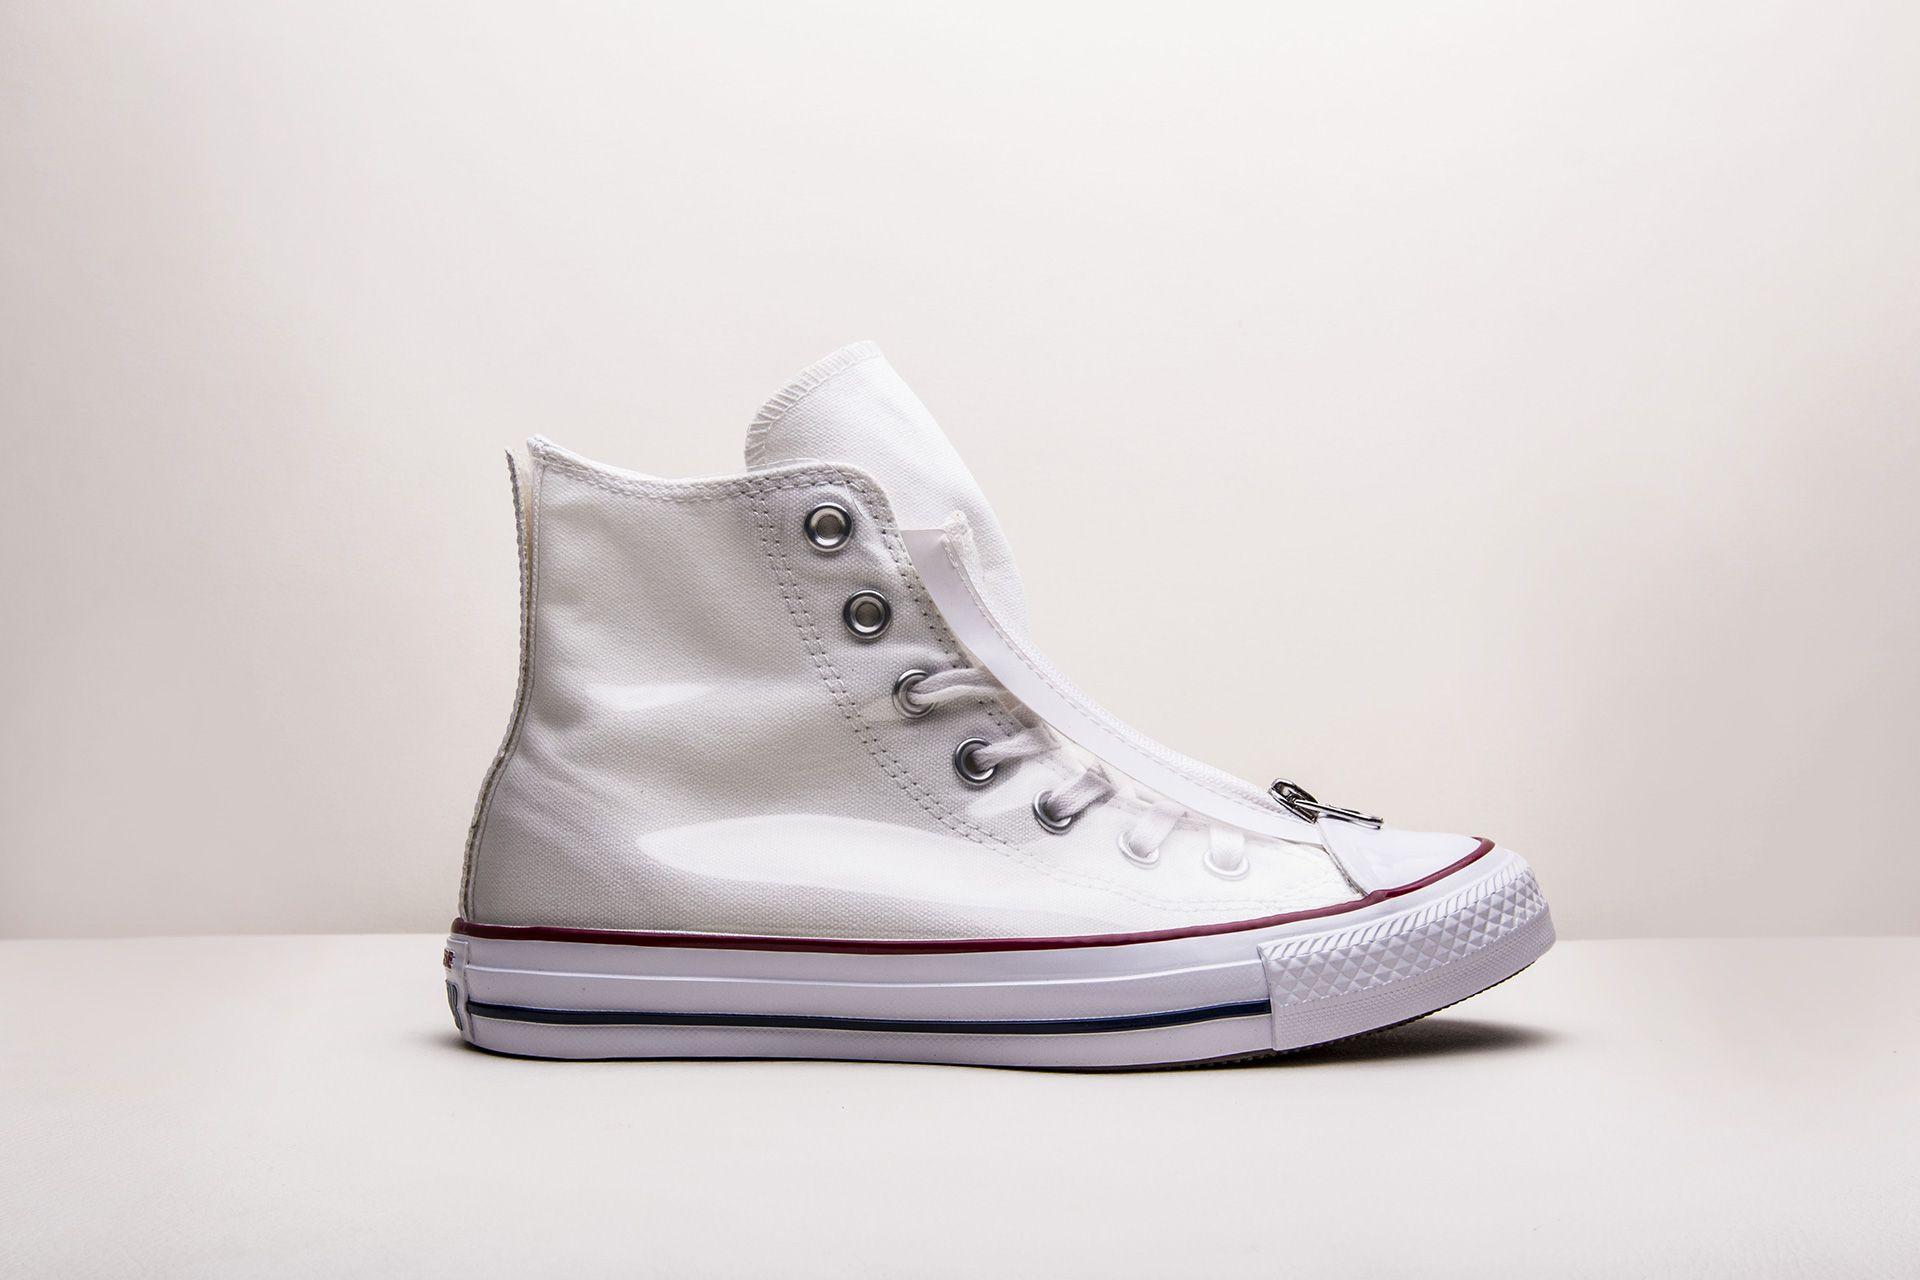 Купить женские белые кеды Converse All Star Shroud Translucent Rubber 3a3cd1e2c5b1e